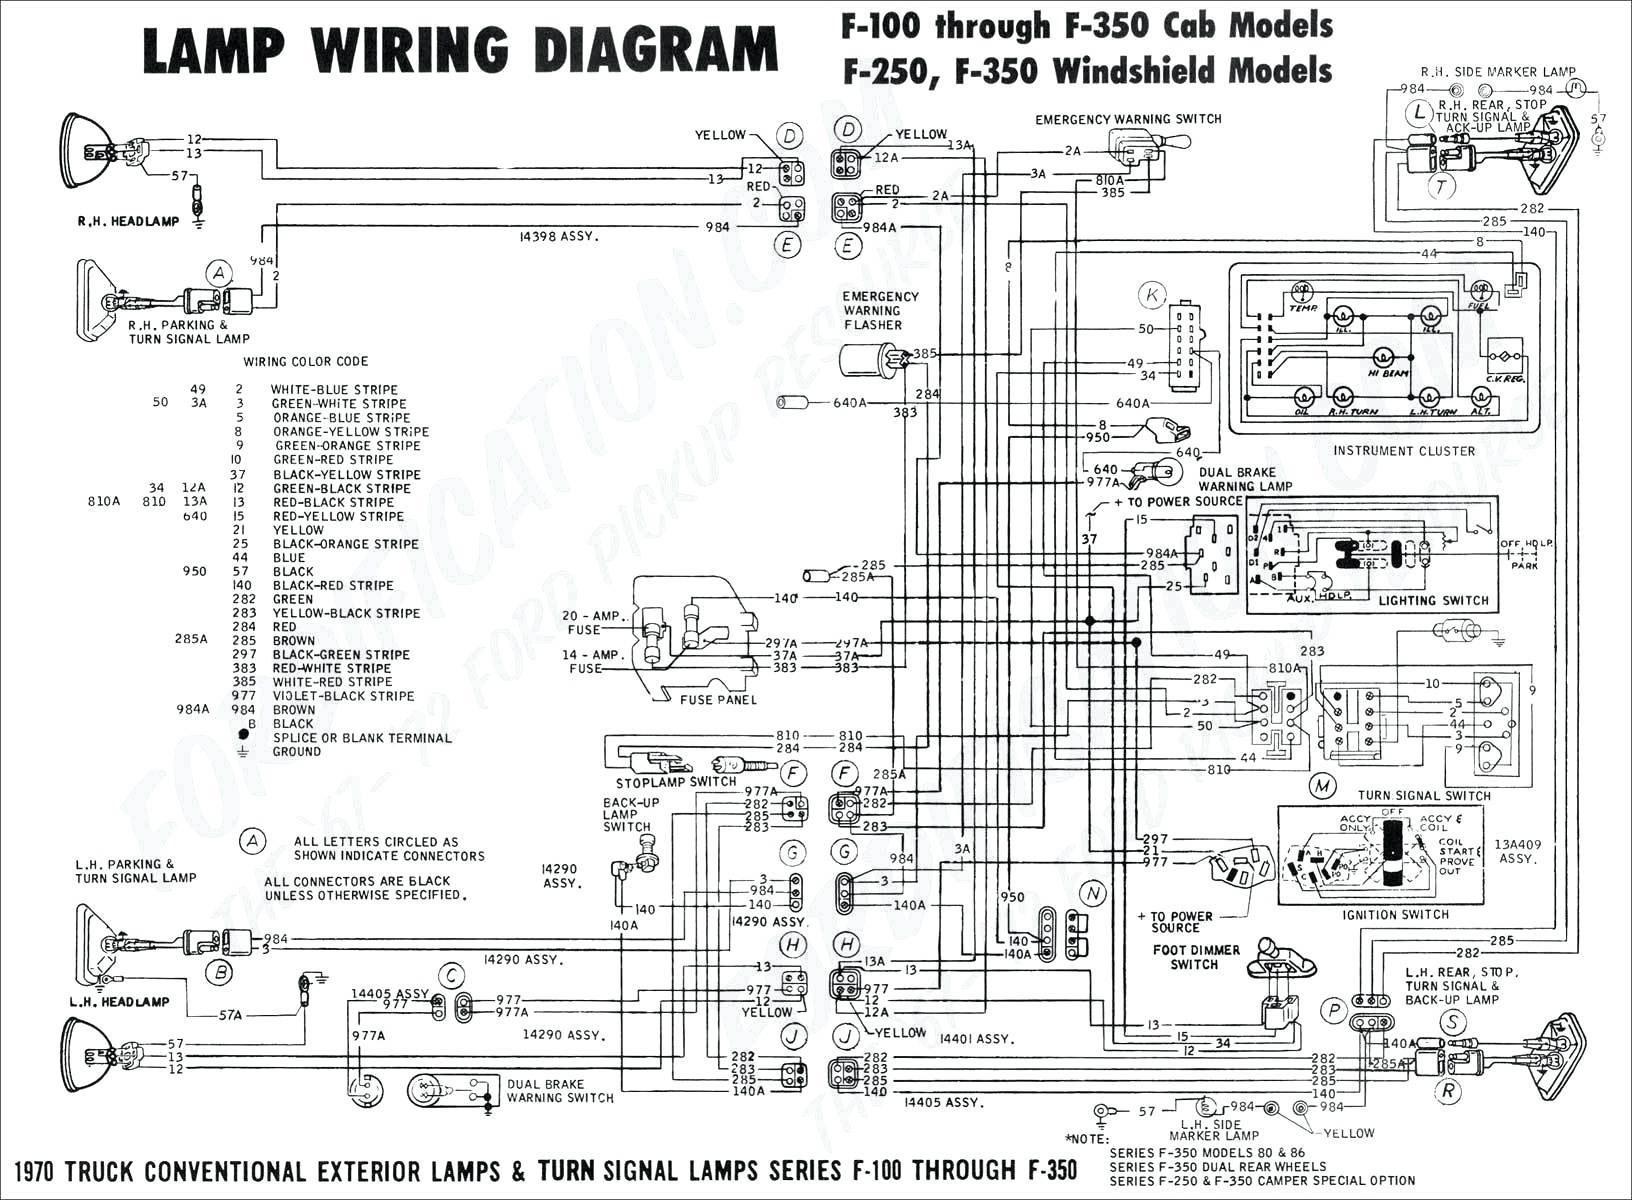 84 Chevy Alternator Wiring Diagram Wiring Diagram Kia Weebly Wiring Diagram Provider Of 84 Chevy Alternator Wiring Diagram